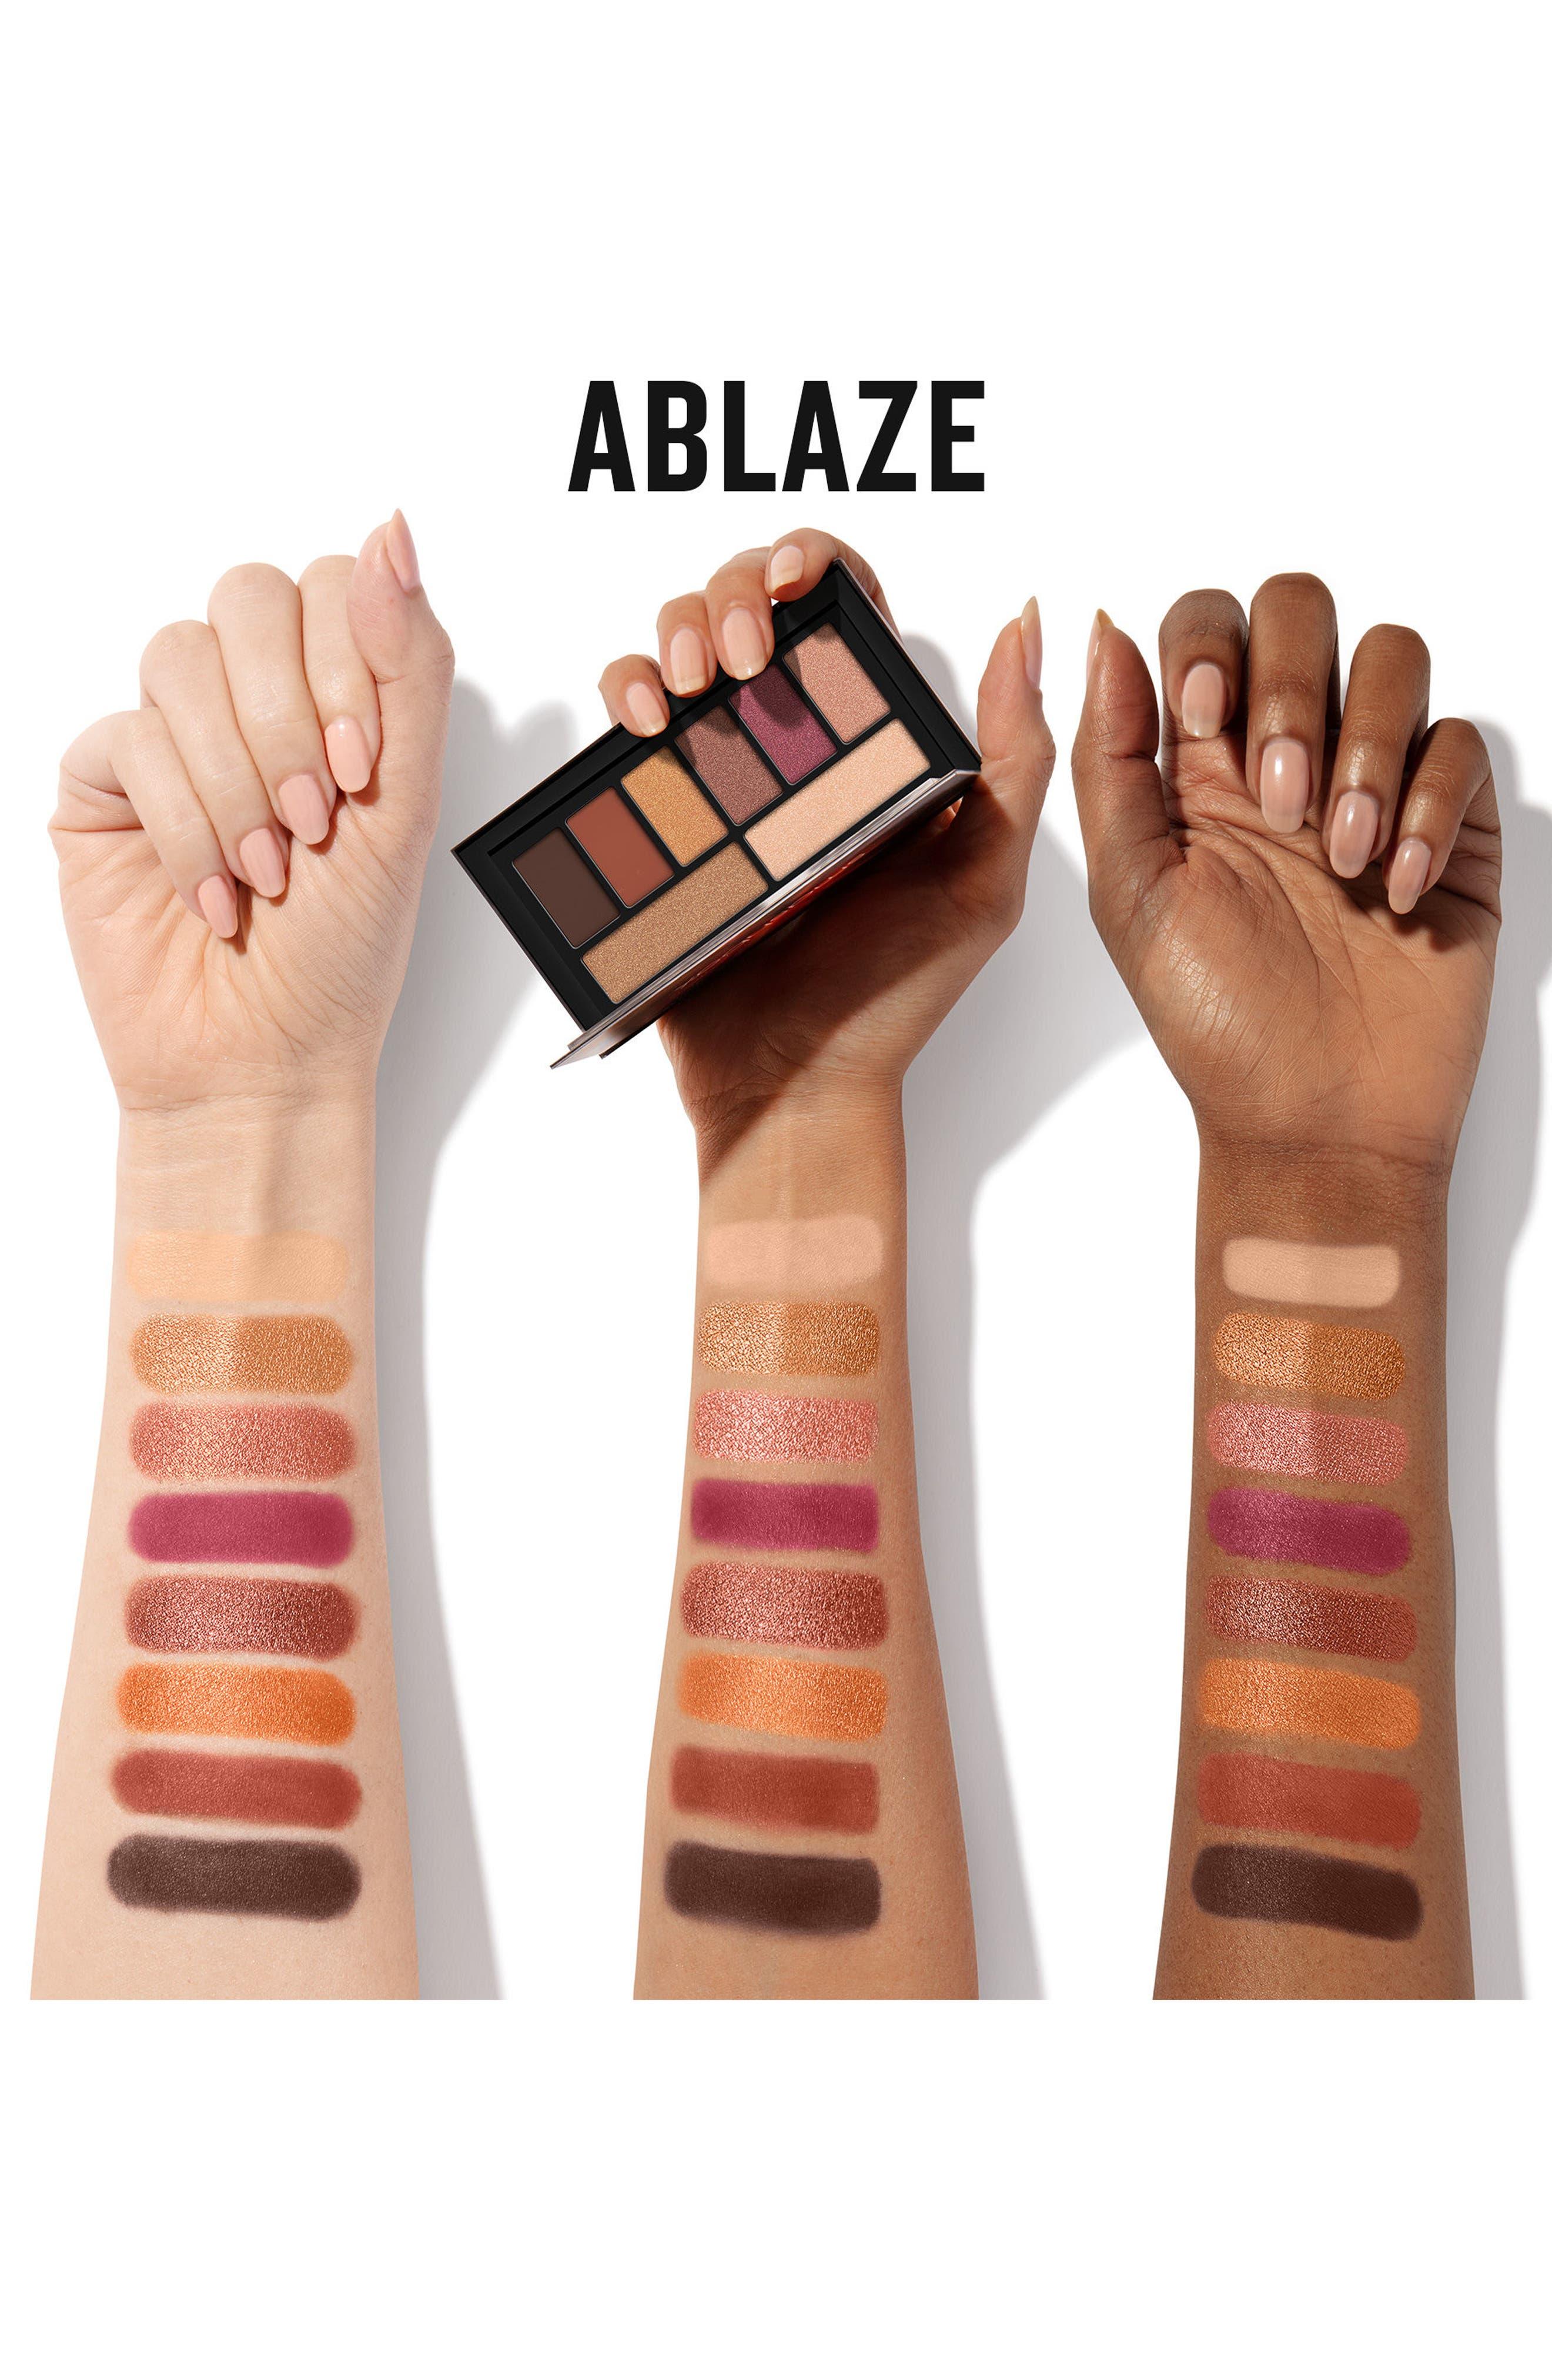 Cover Shot Ablaze Eyeshadow Palette,                             Alternate thumbnail 2, color,                             ABLAZE